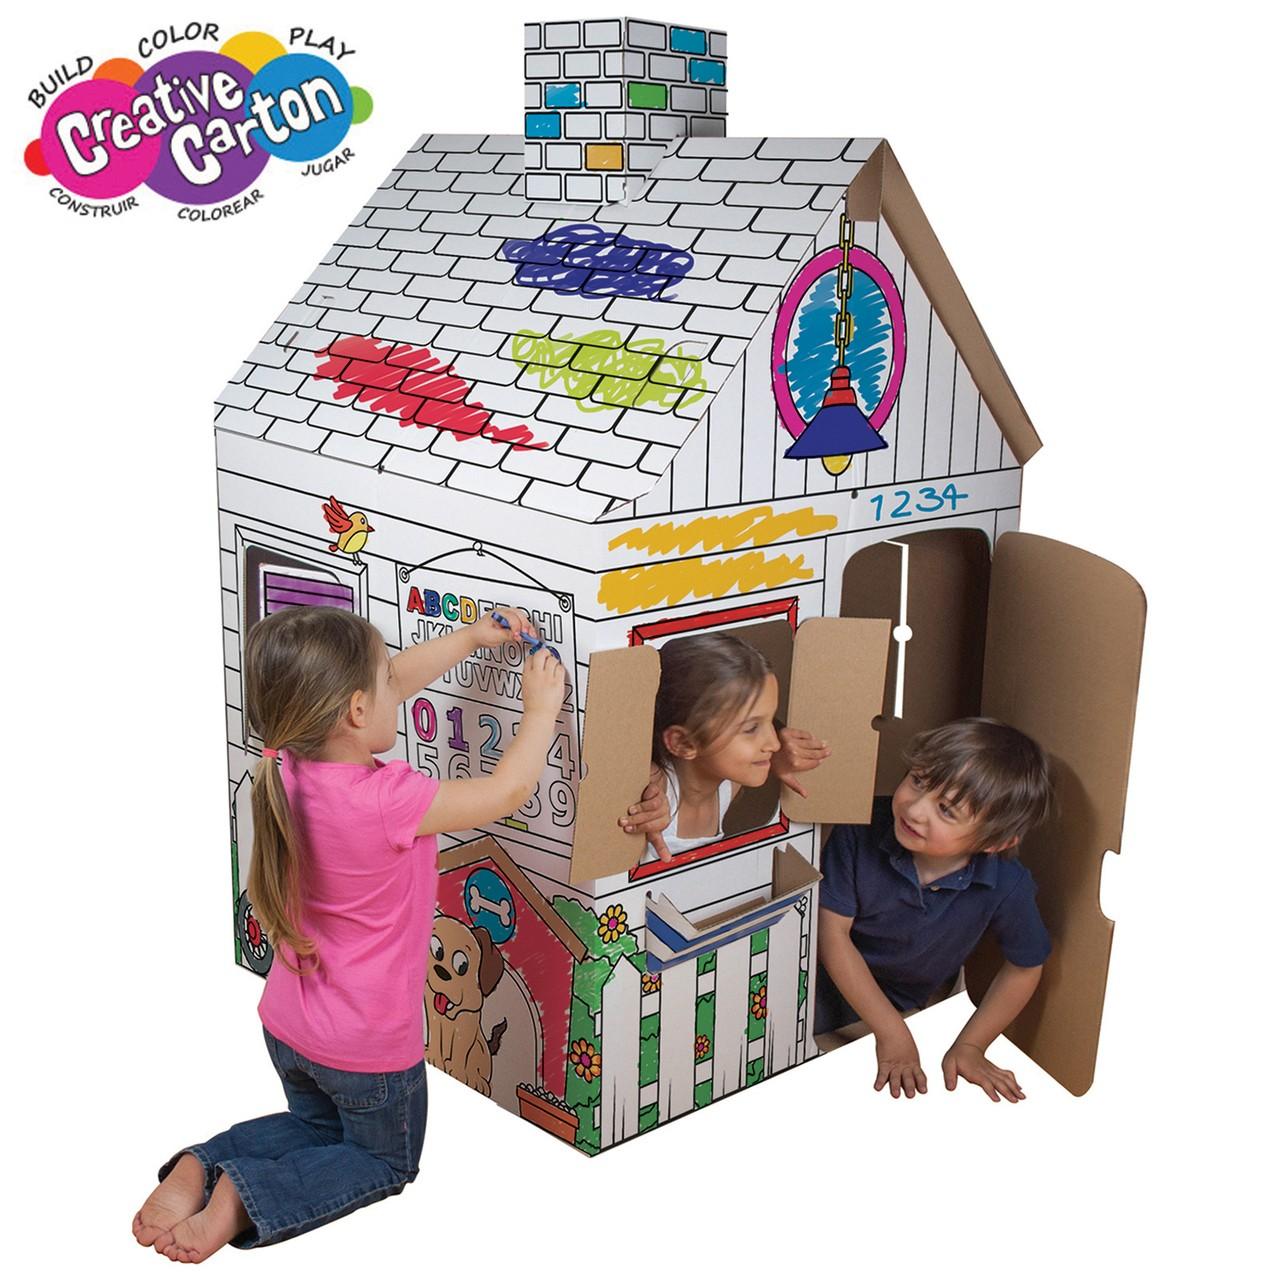 Color & Create Cardboard Playhouse